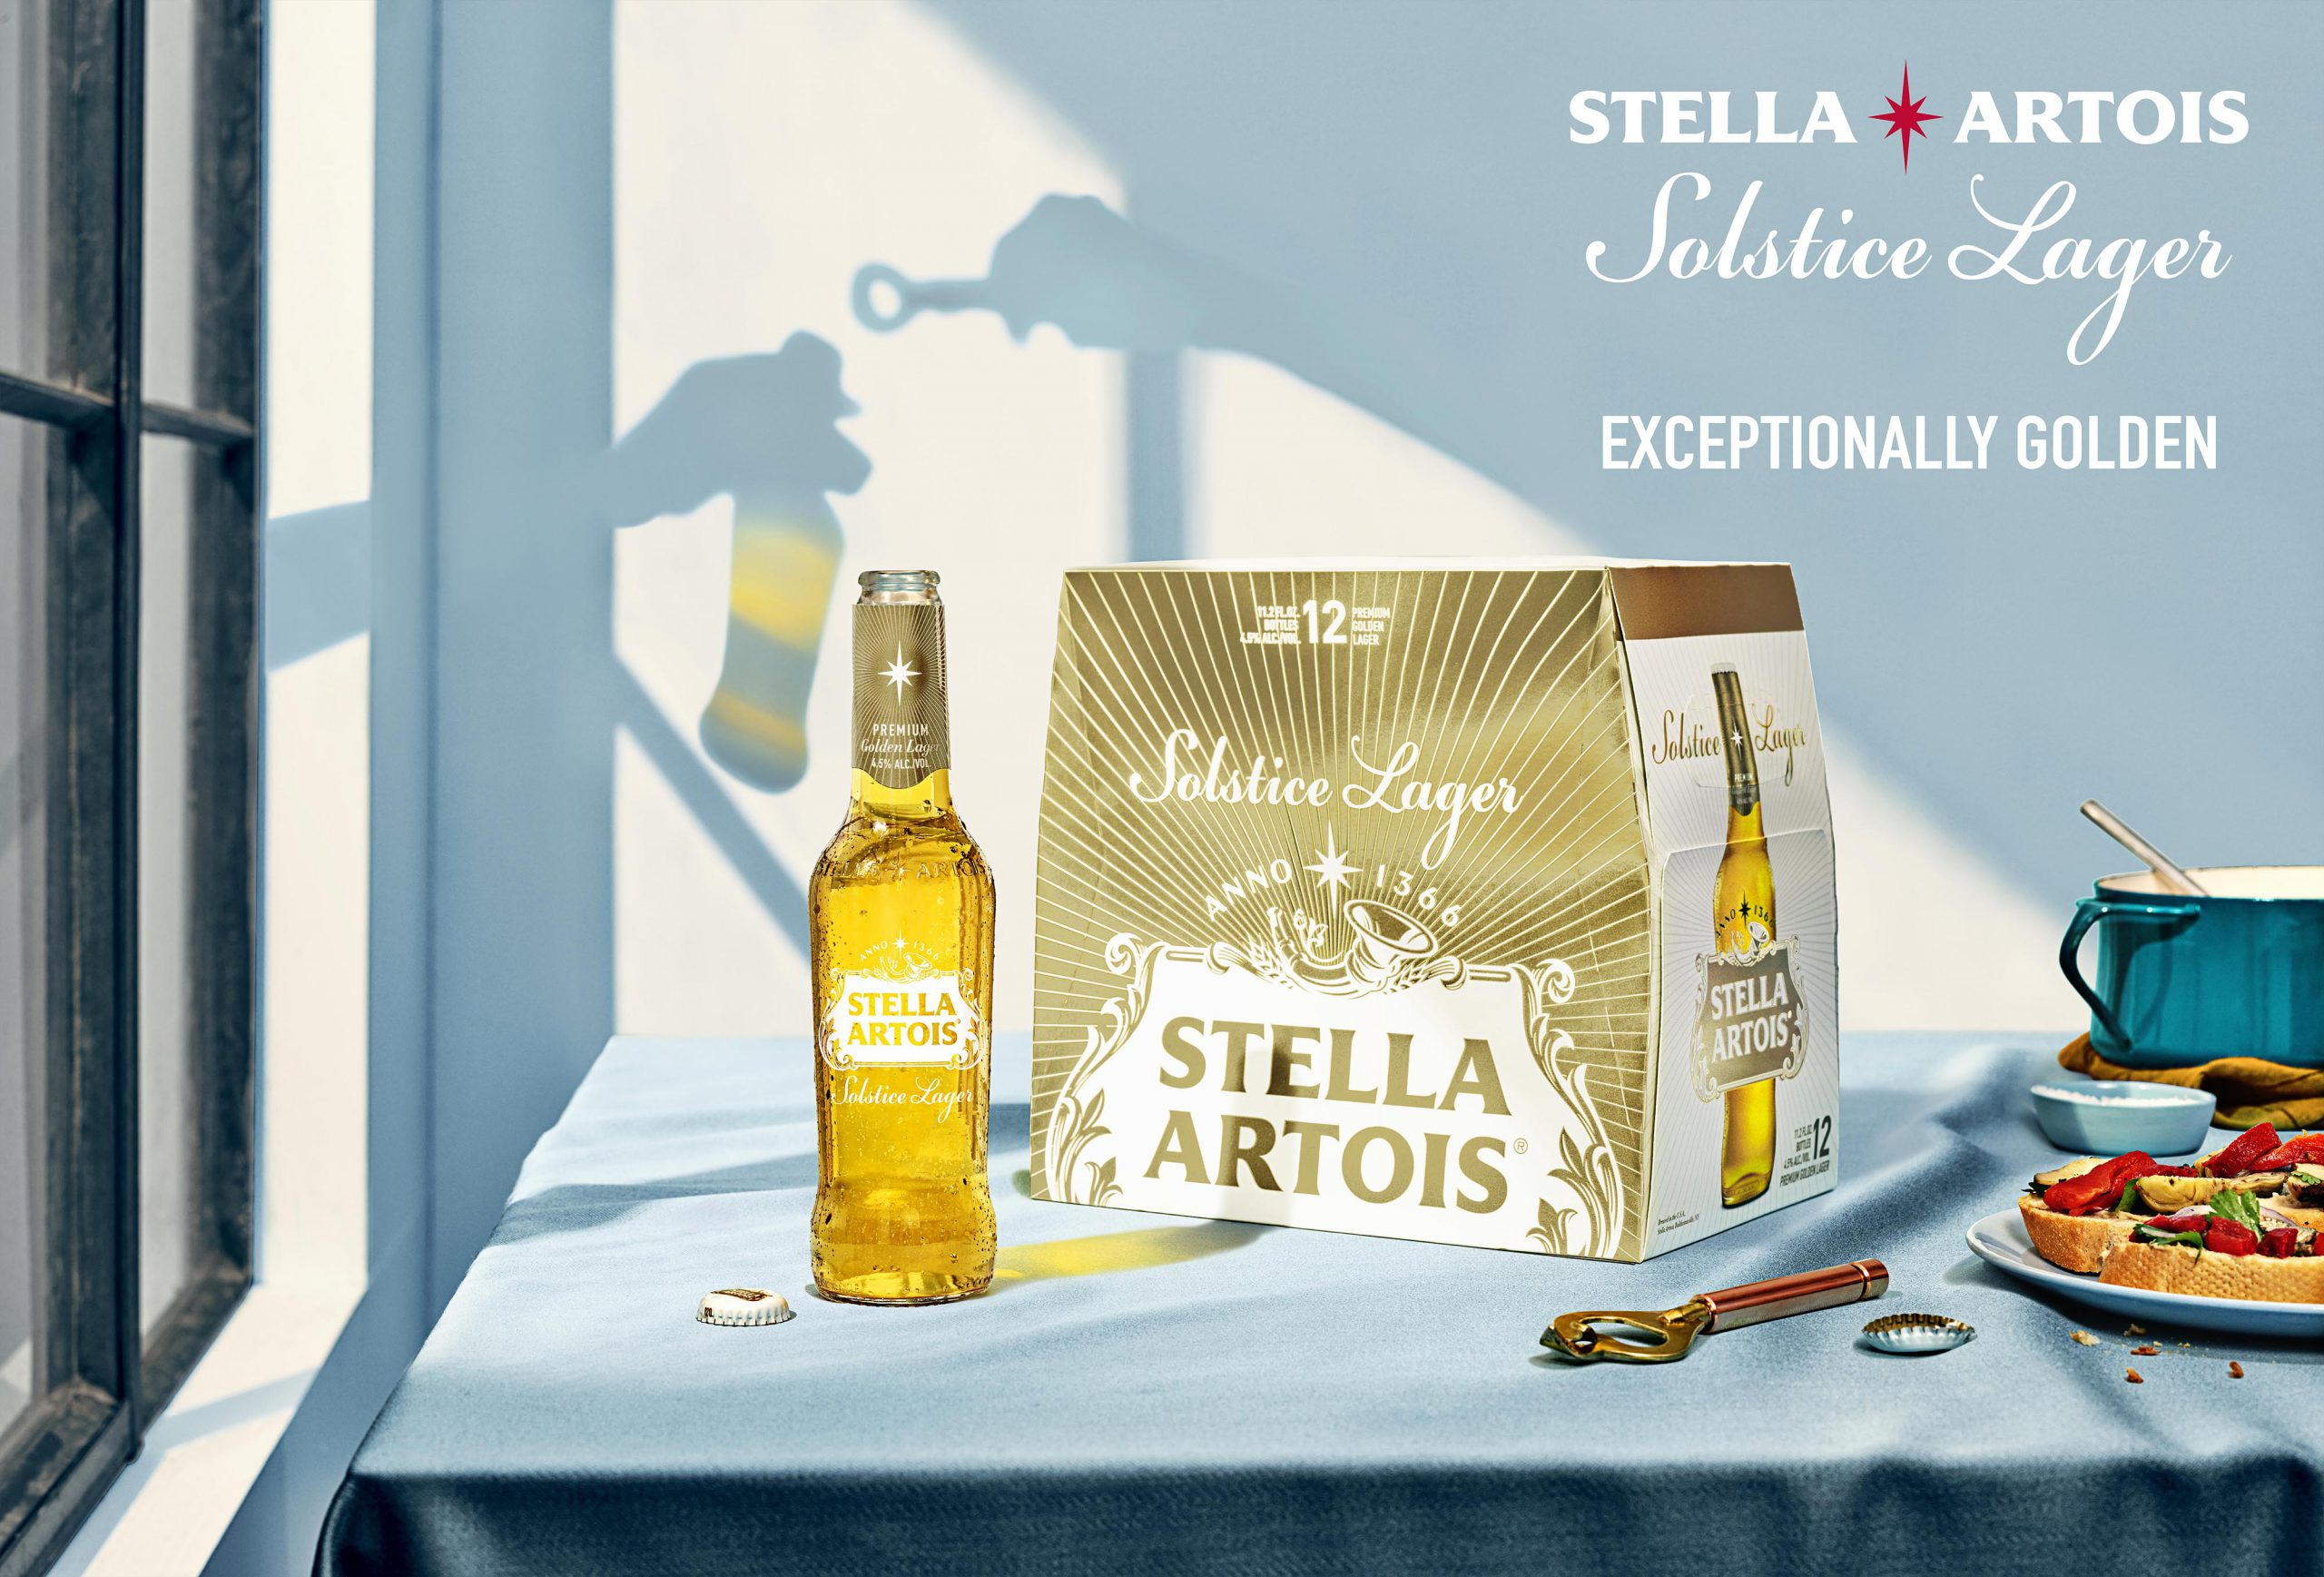 Anheuser-busch Makes Solstice Lager Permanent Part Of Stella Artois Portfolio photo